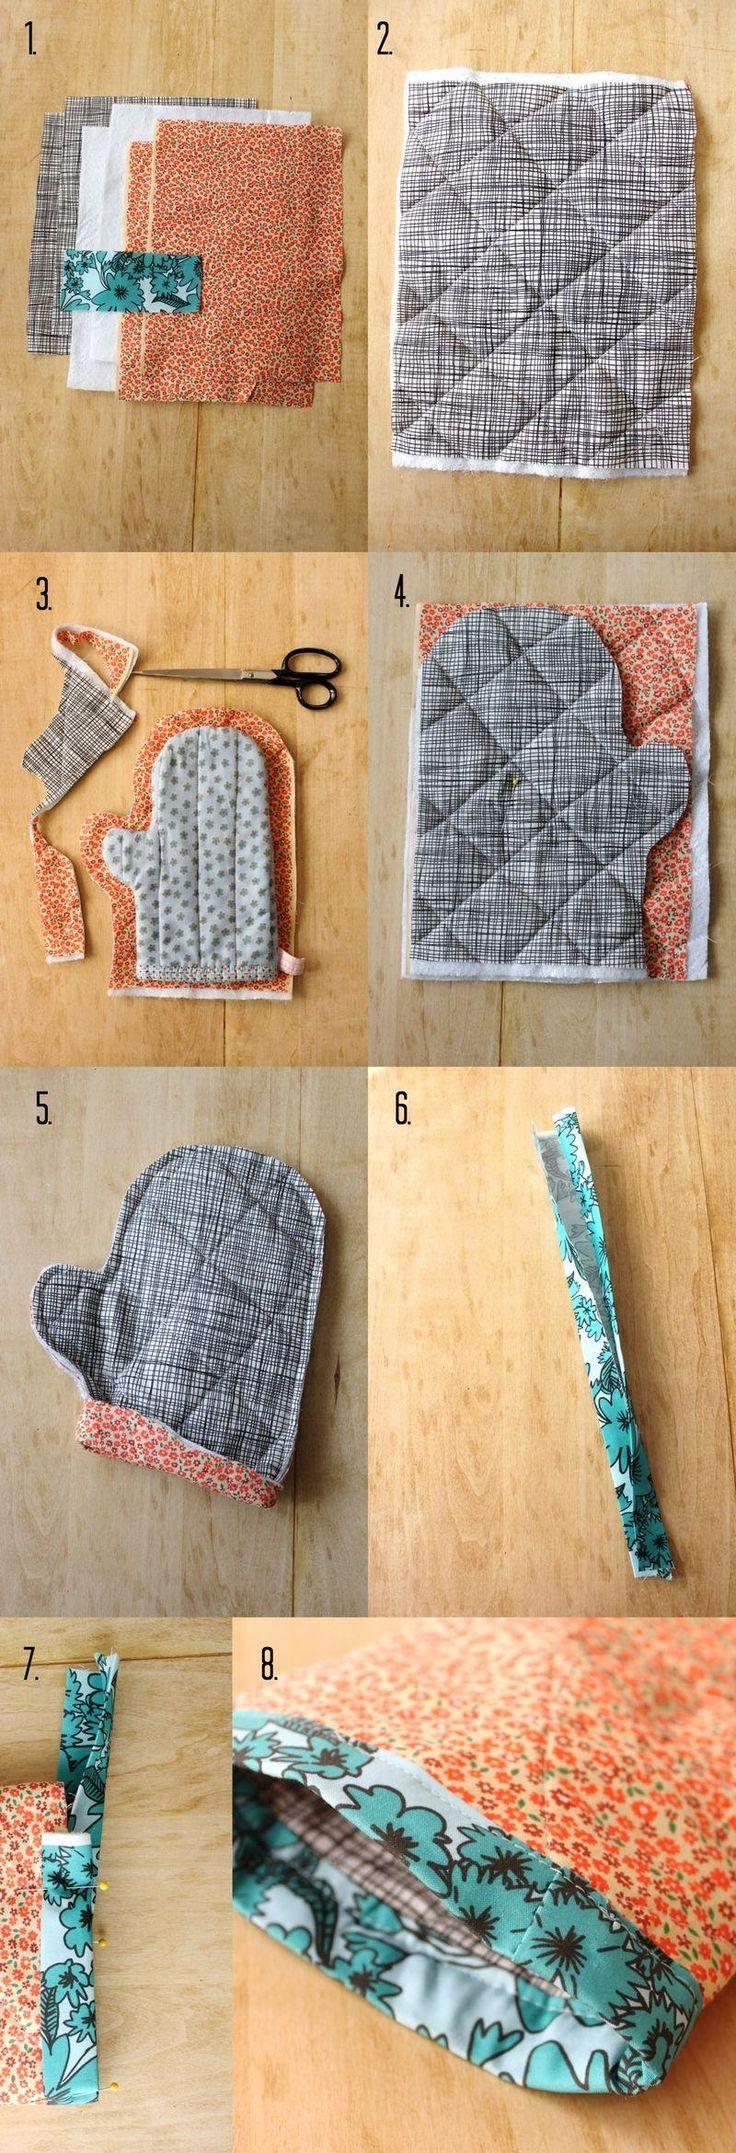 9 best patch Topflappen images on Pinterest | Hot pads, Pot holders ...